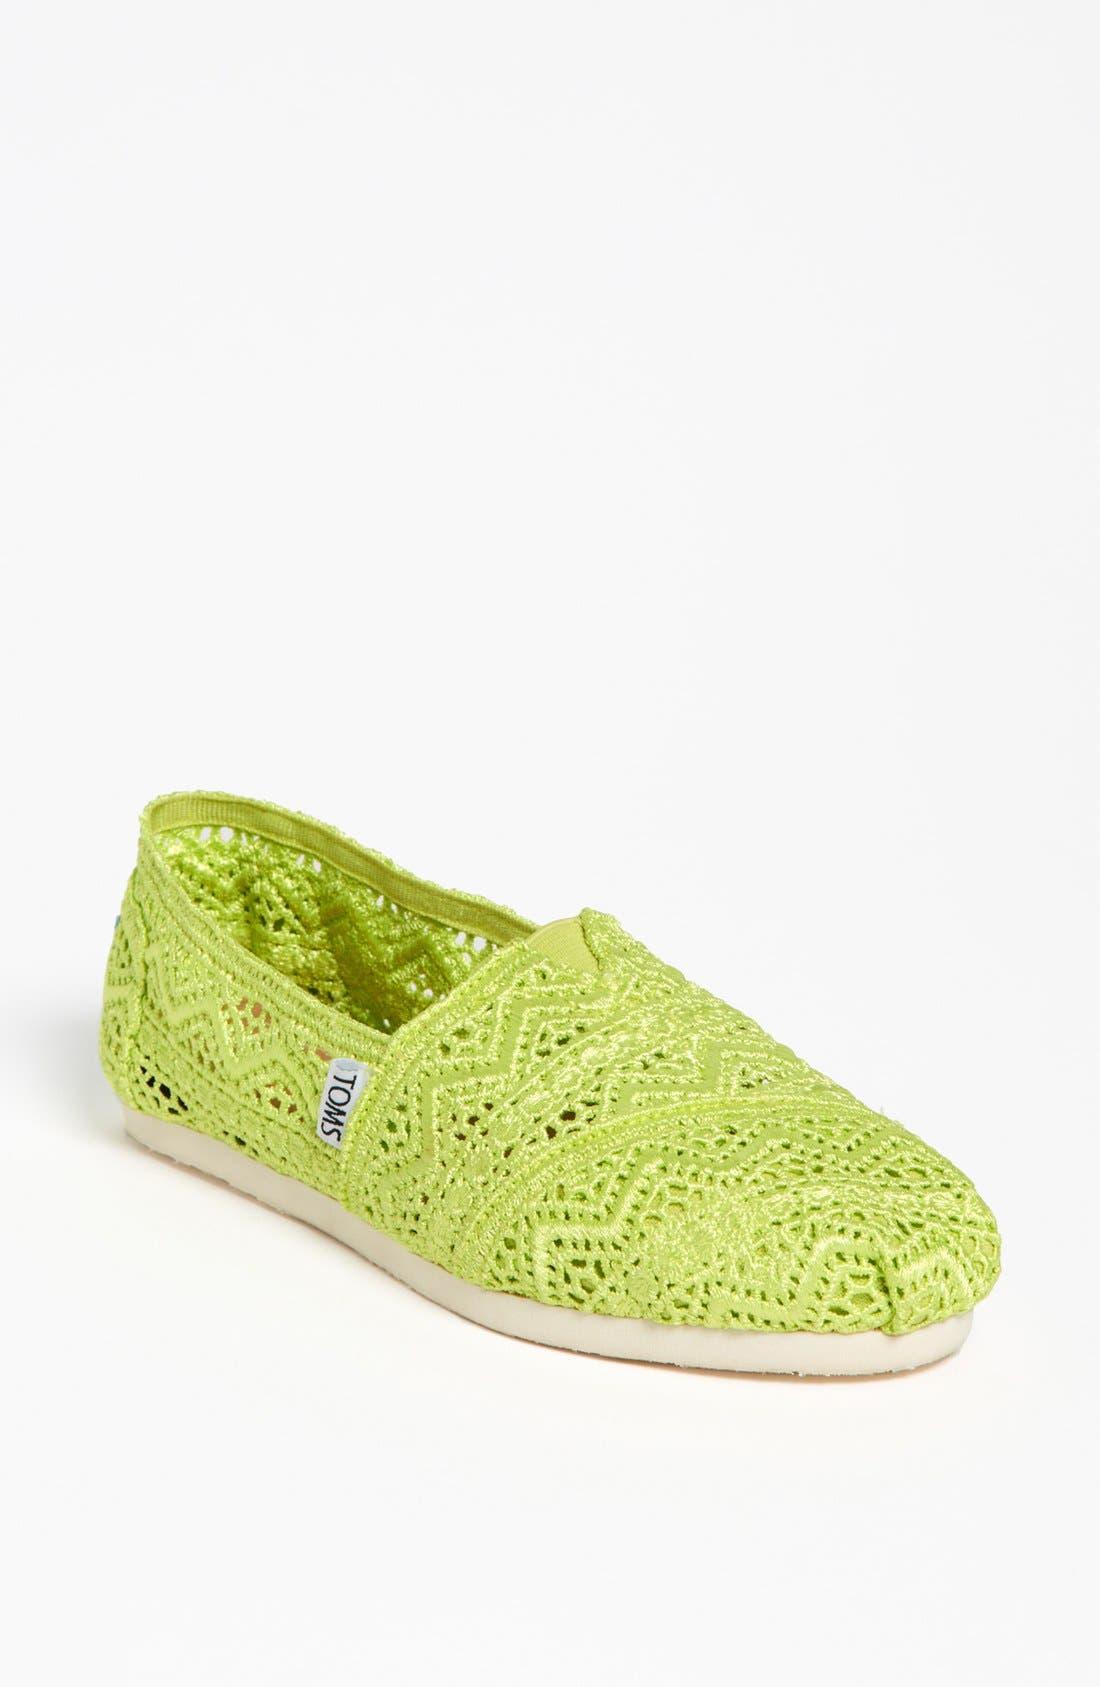 Main Image - TOMS 'Classic - Neon' Crochet Slip-On (Women)